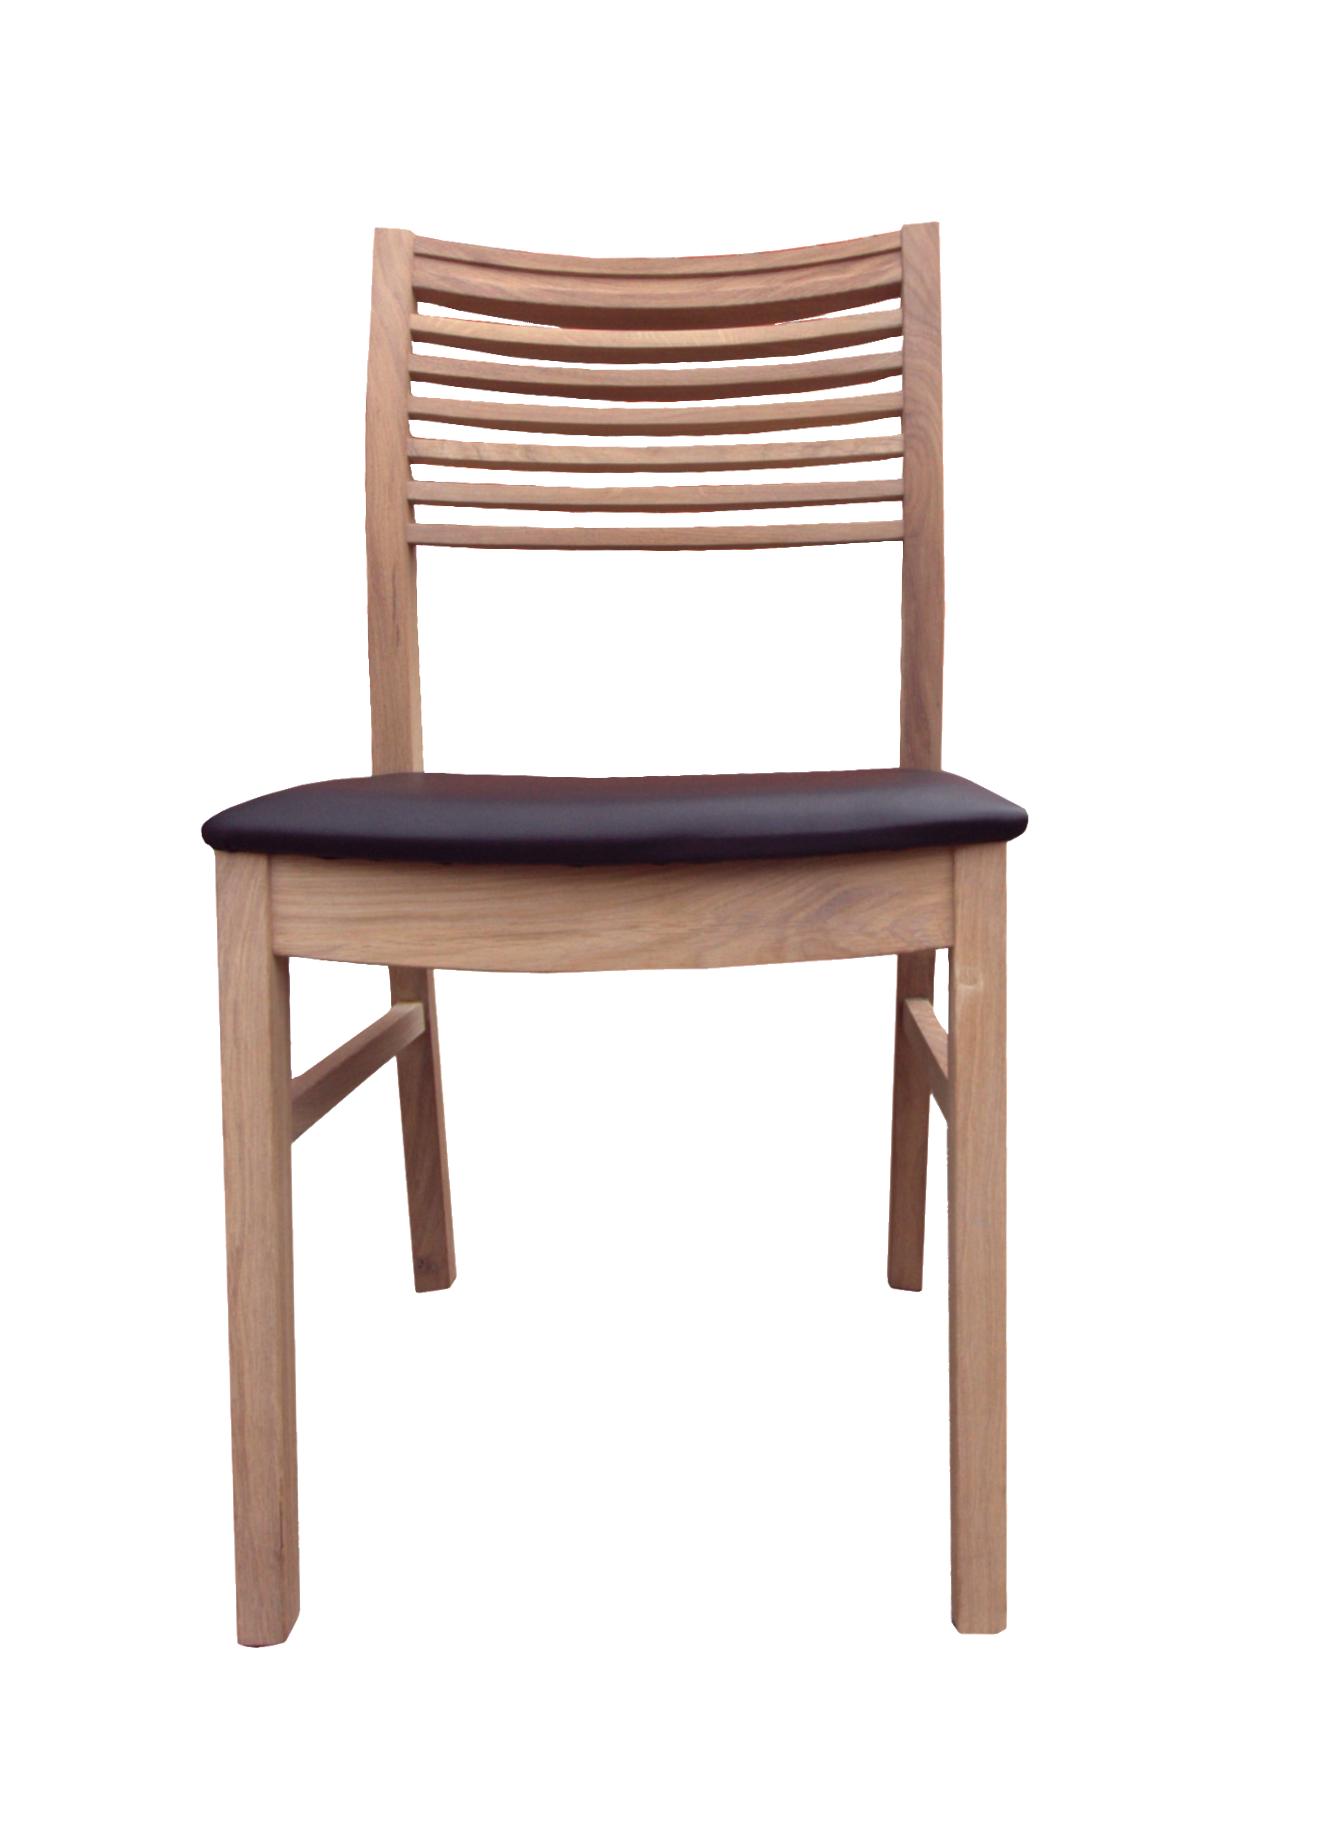 Jette stol Kvalitetsmøbler.dk